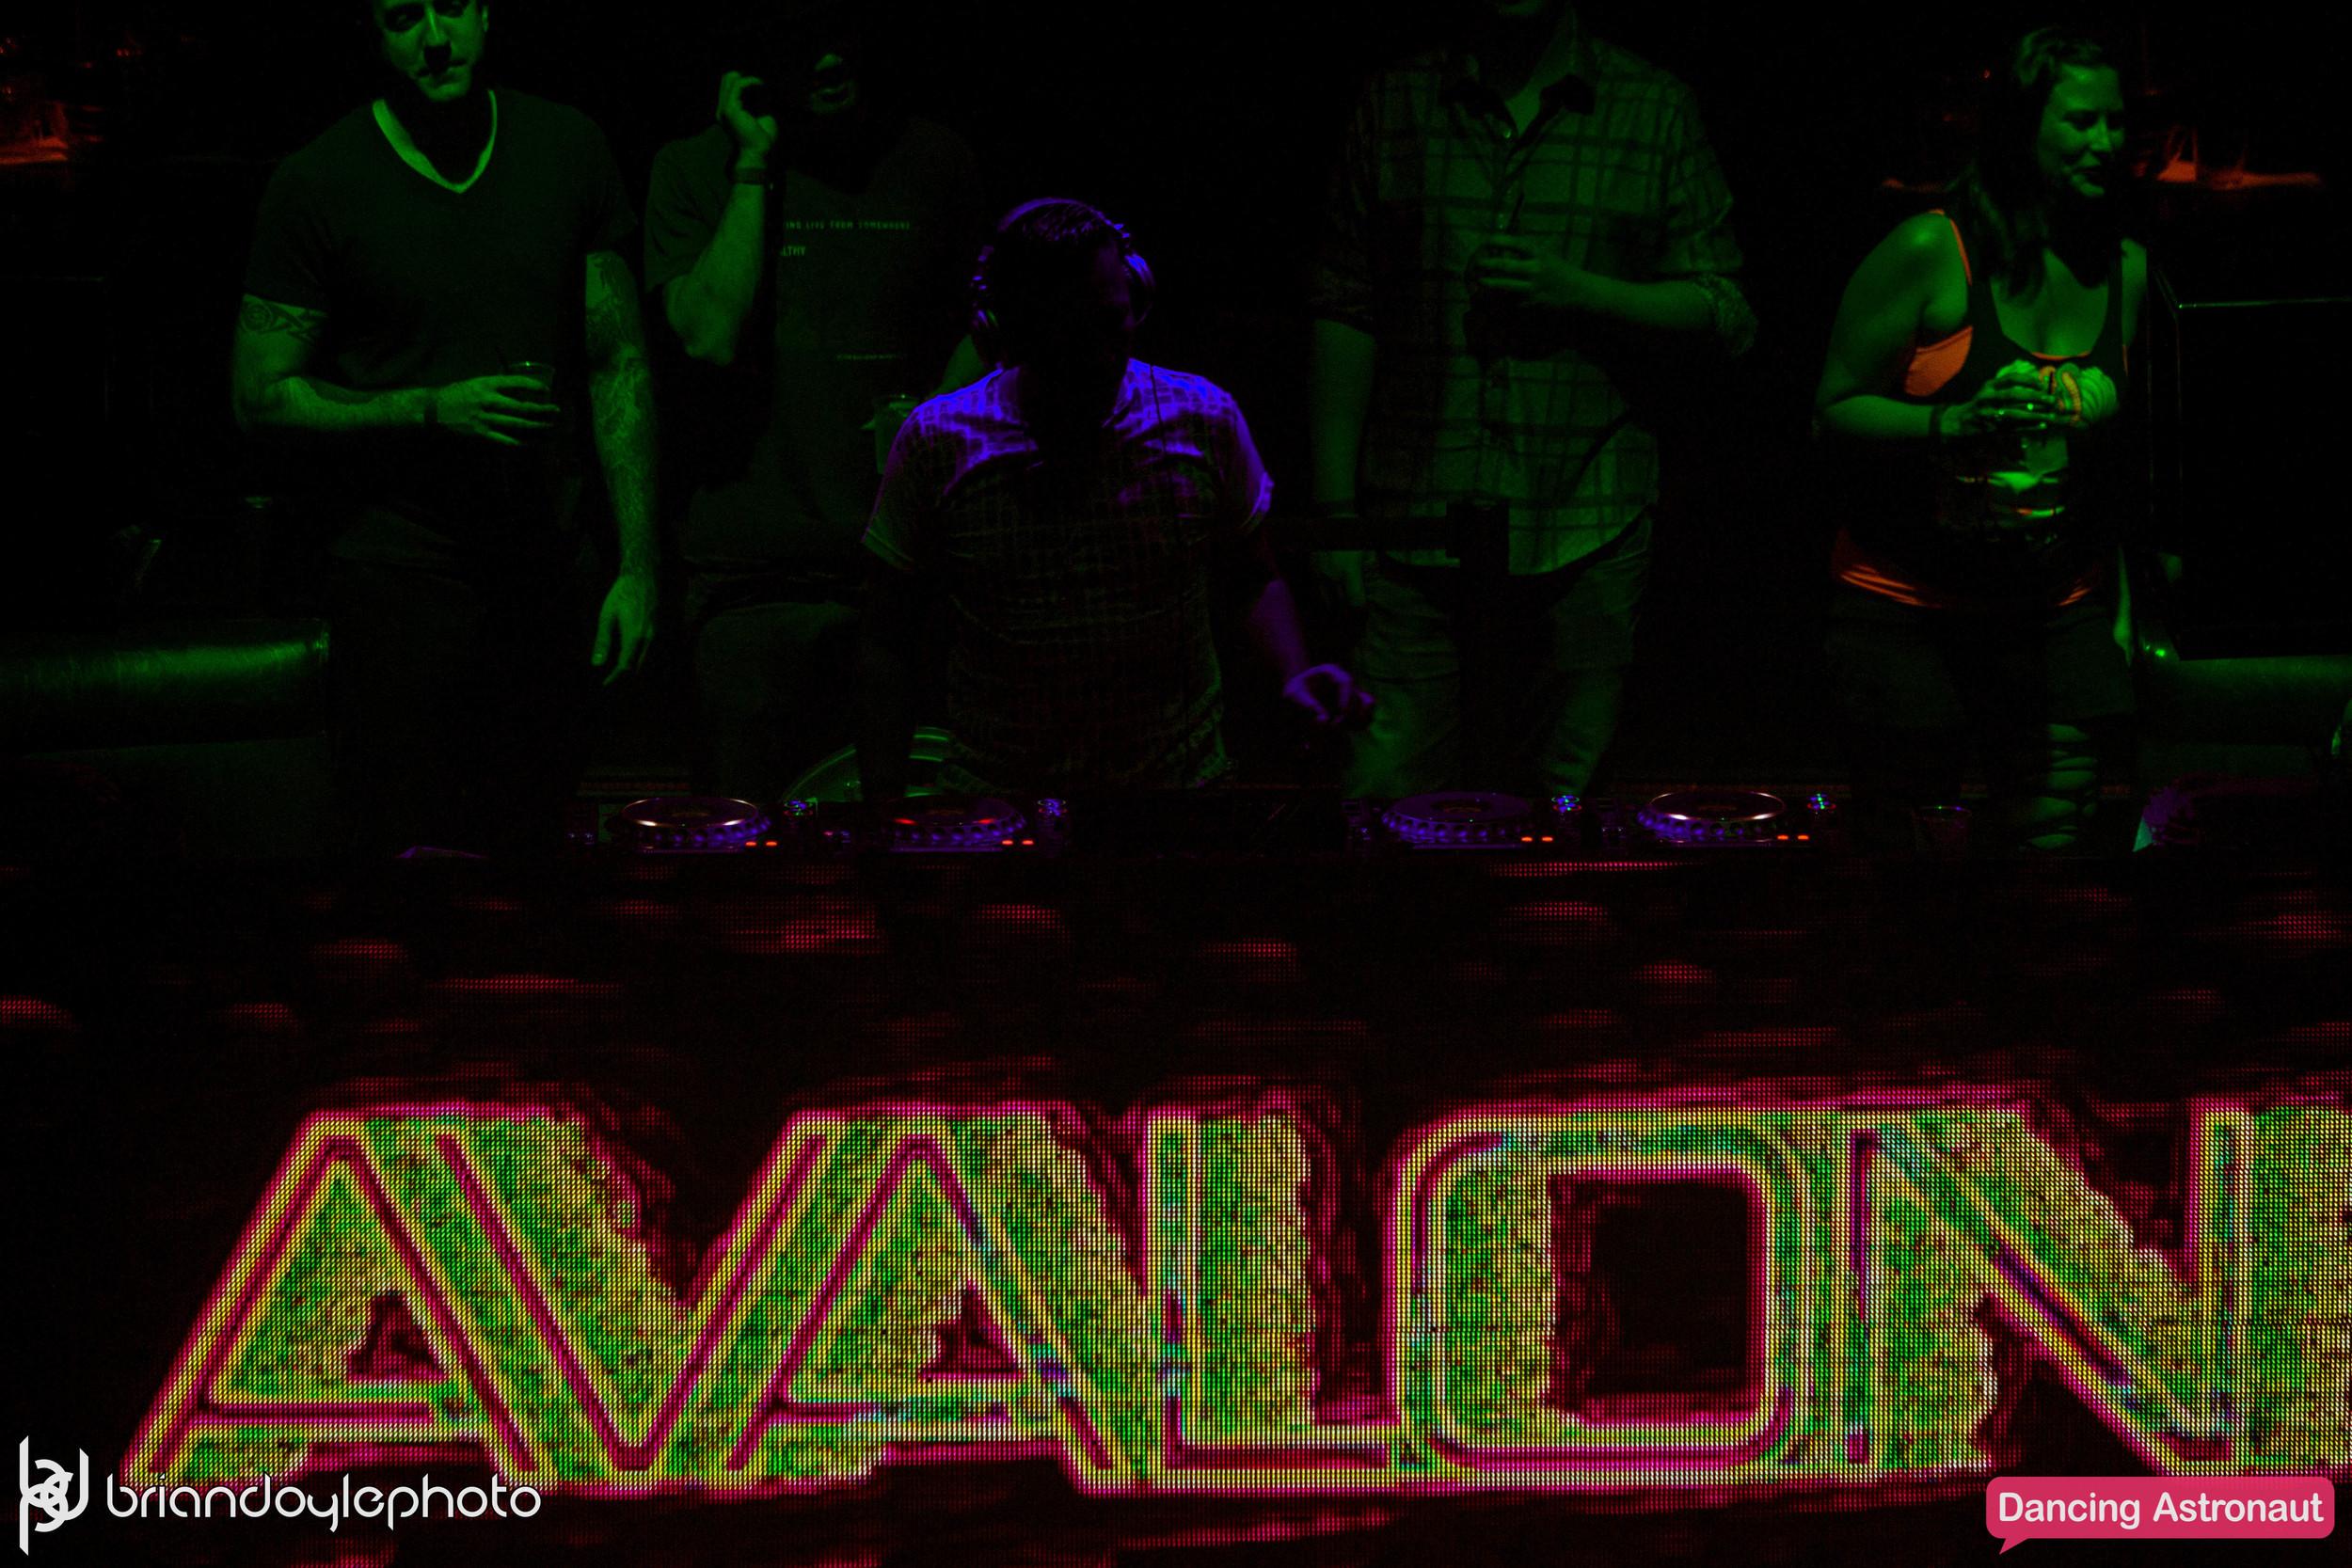 Max Vangeli @ Avalon bdp 25.10.2014-9.jpg